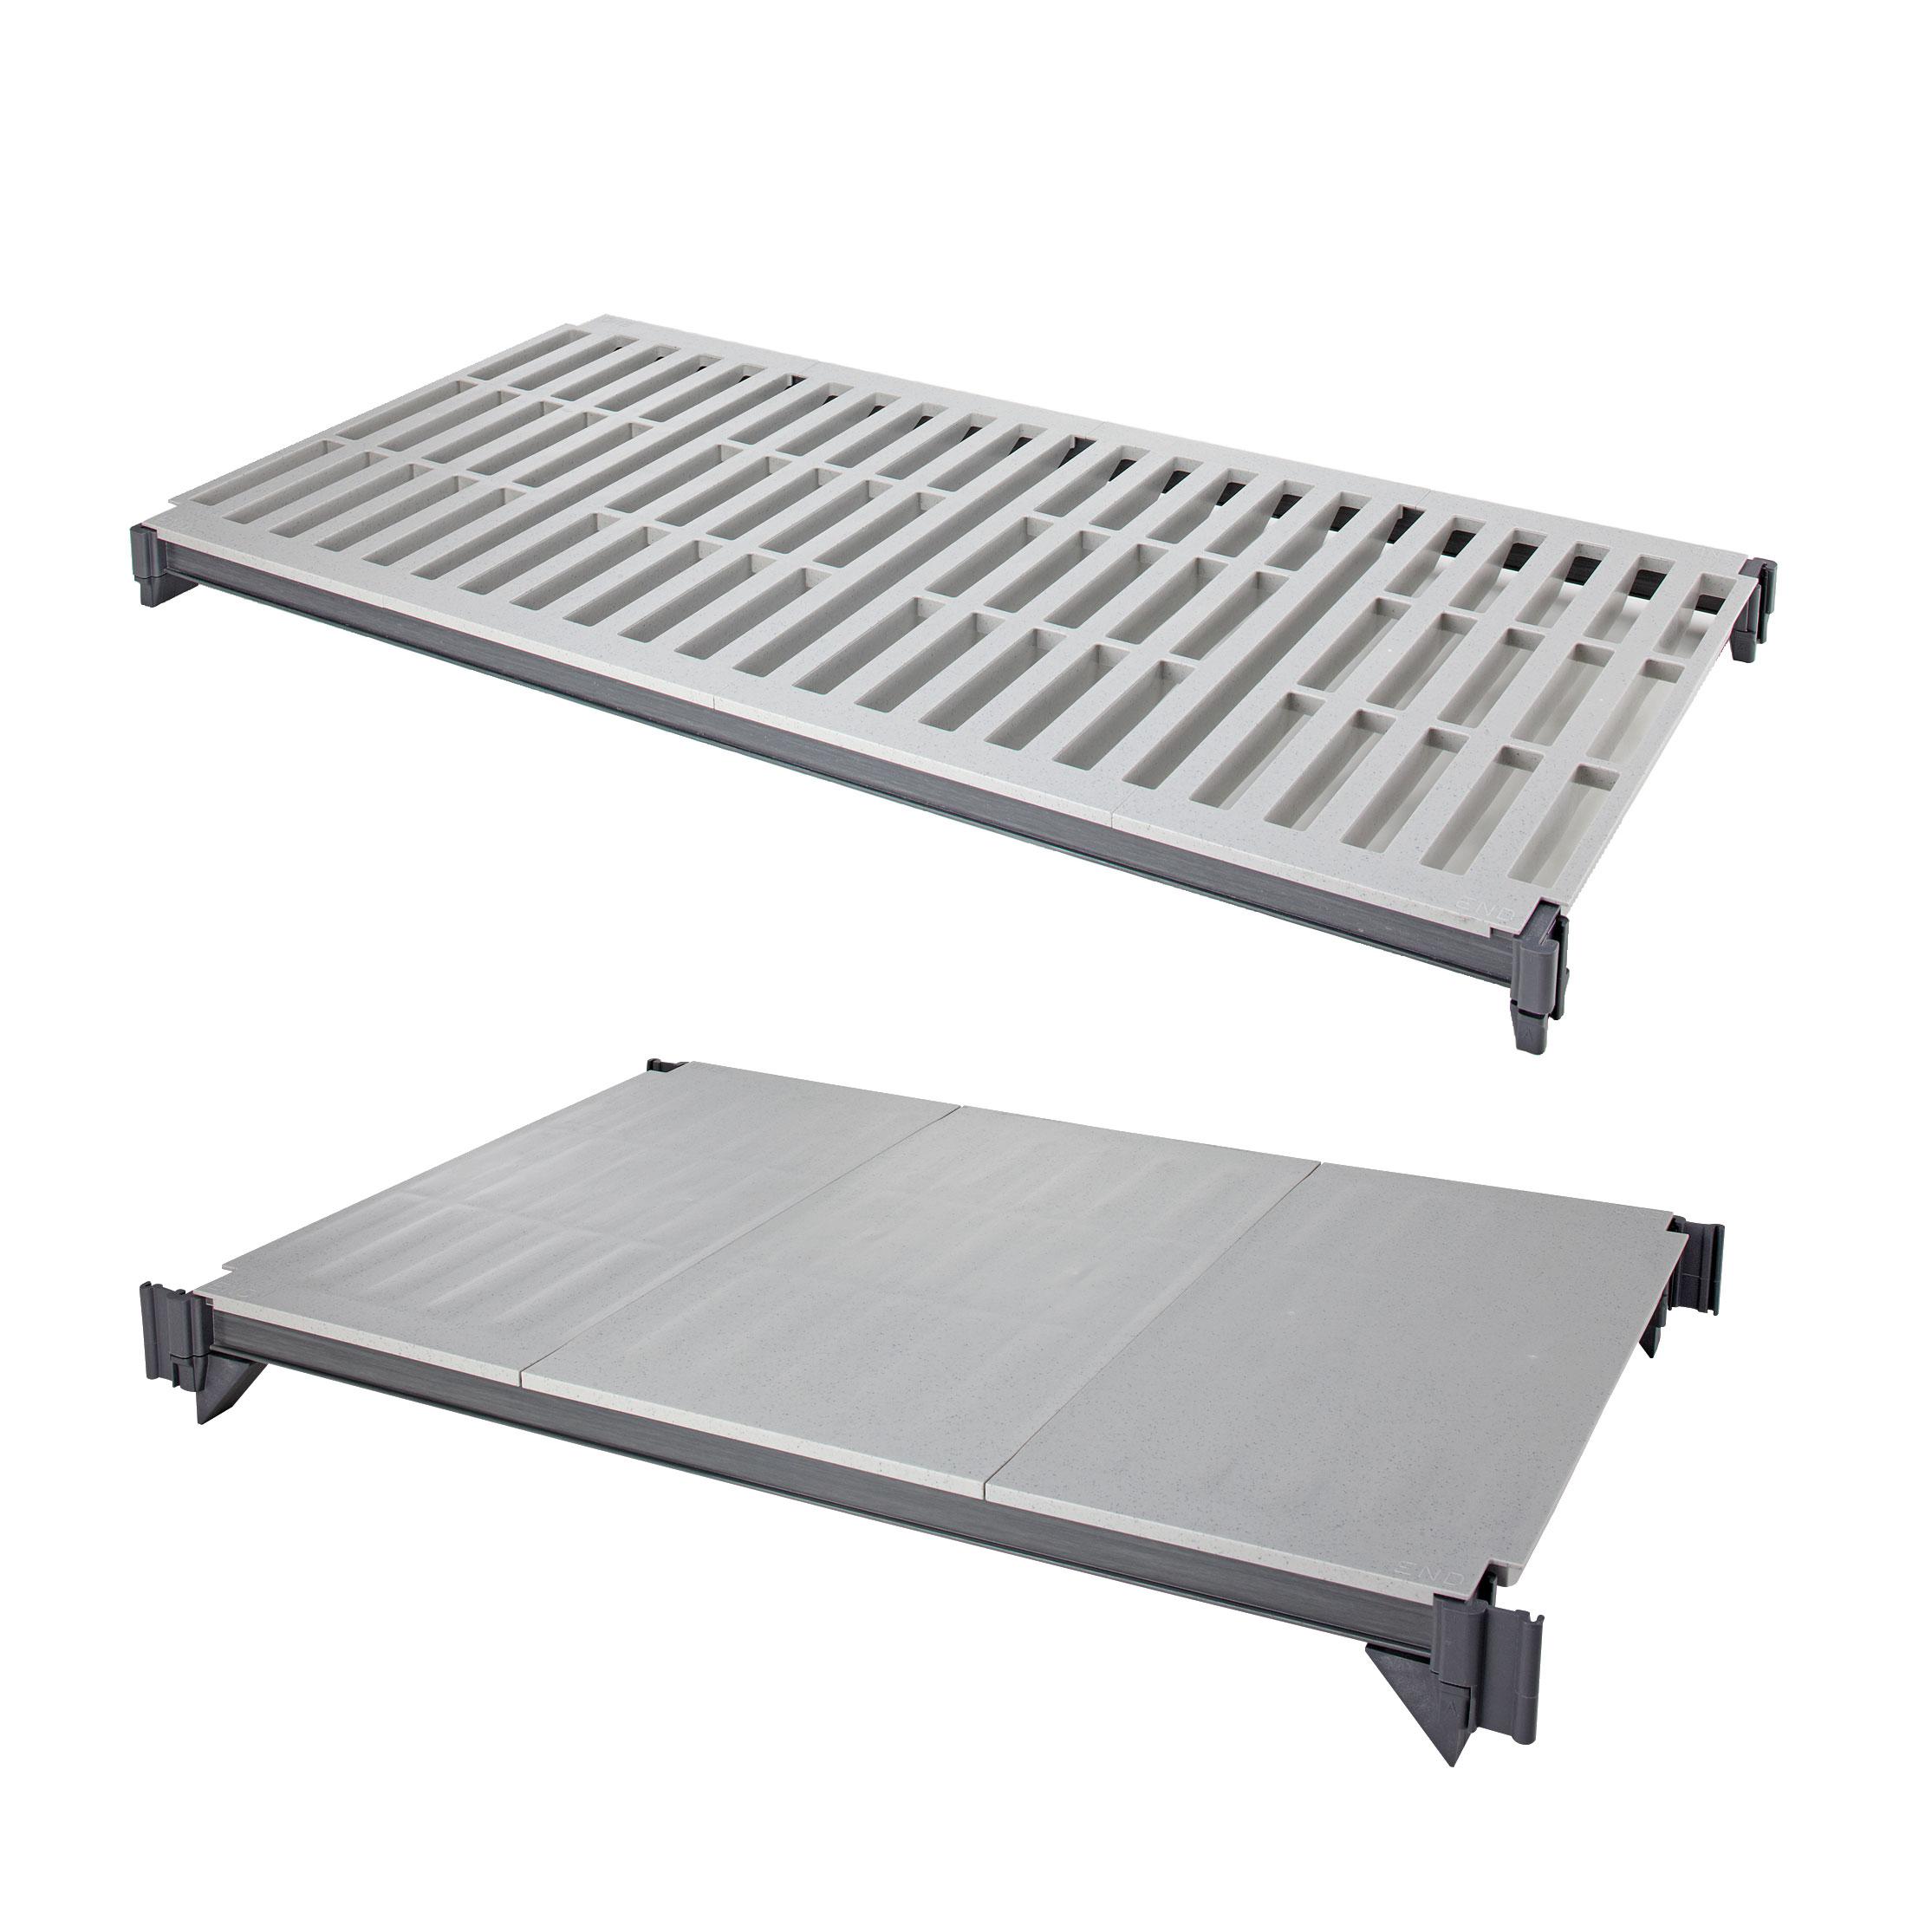 Cambro CBSK1842VS4580 shelving/shelving systems